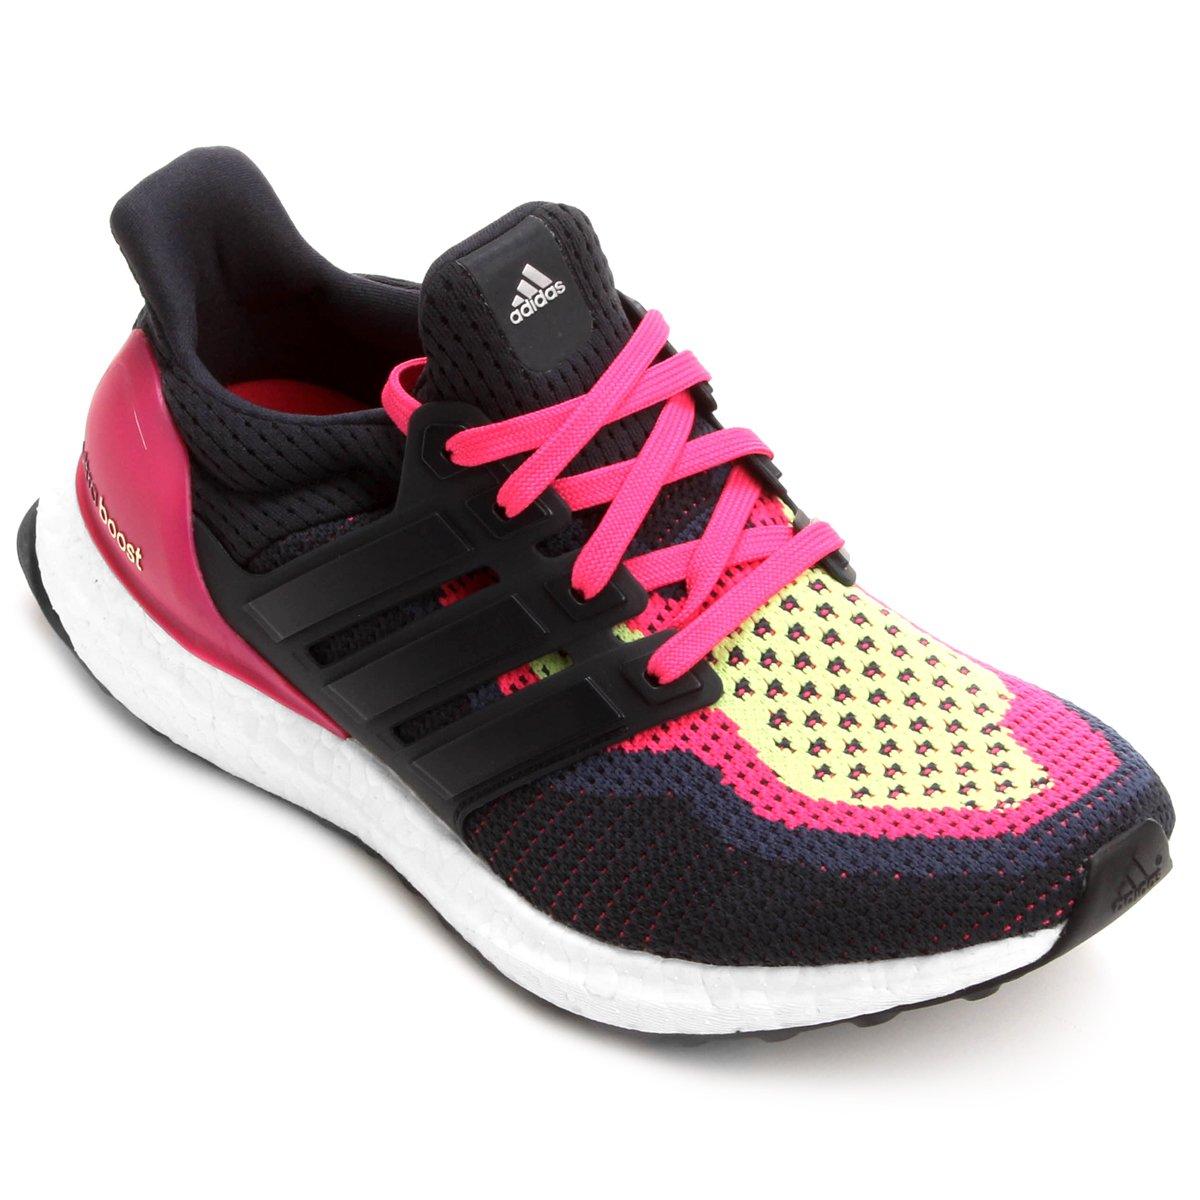 norway running palo rosa adidas ultraboost w 1cdee 3c096  canada tênis  adidas ultra boost feminino pretorosa ae243 7803d e0db171b58b3d